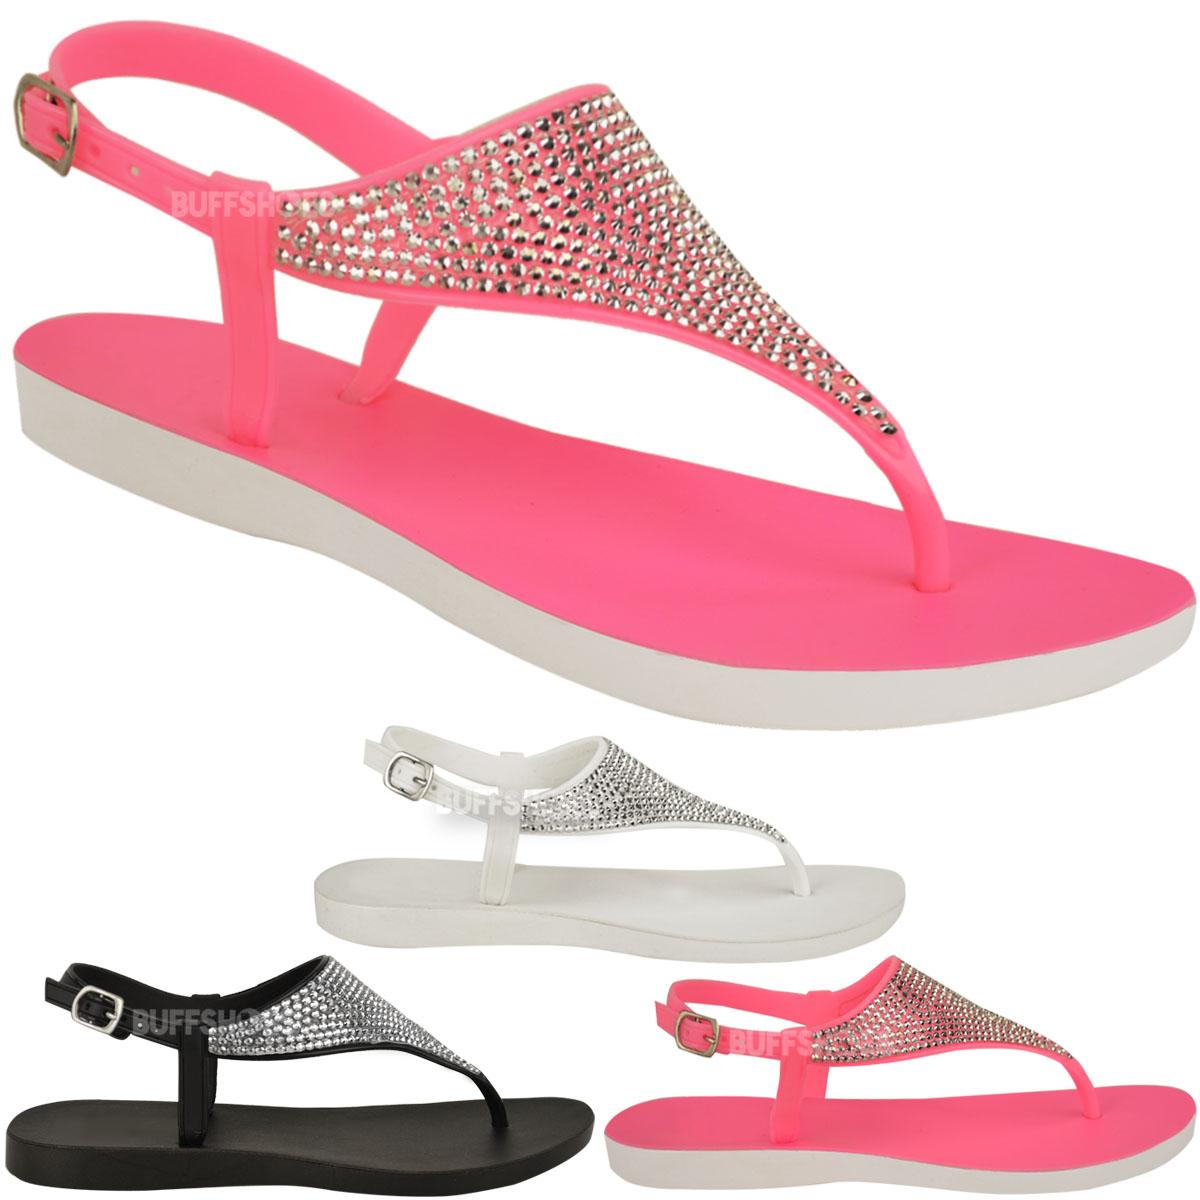 gelee strass sandalen damen flach zehentrenner strand. Black Bedroom Furniture Sets. Home Design Ideas